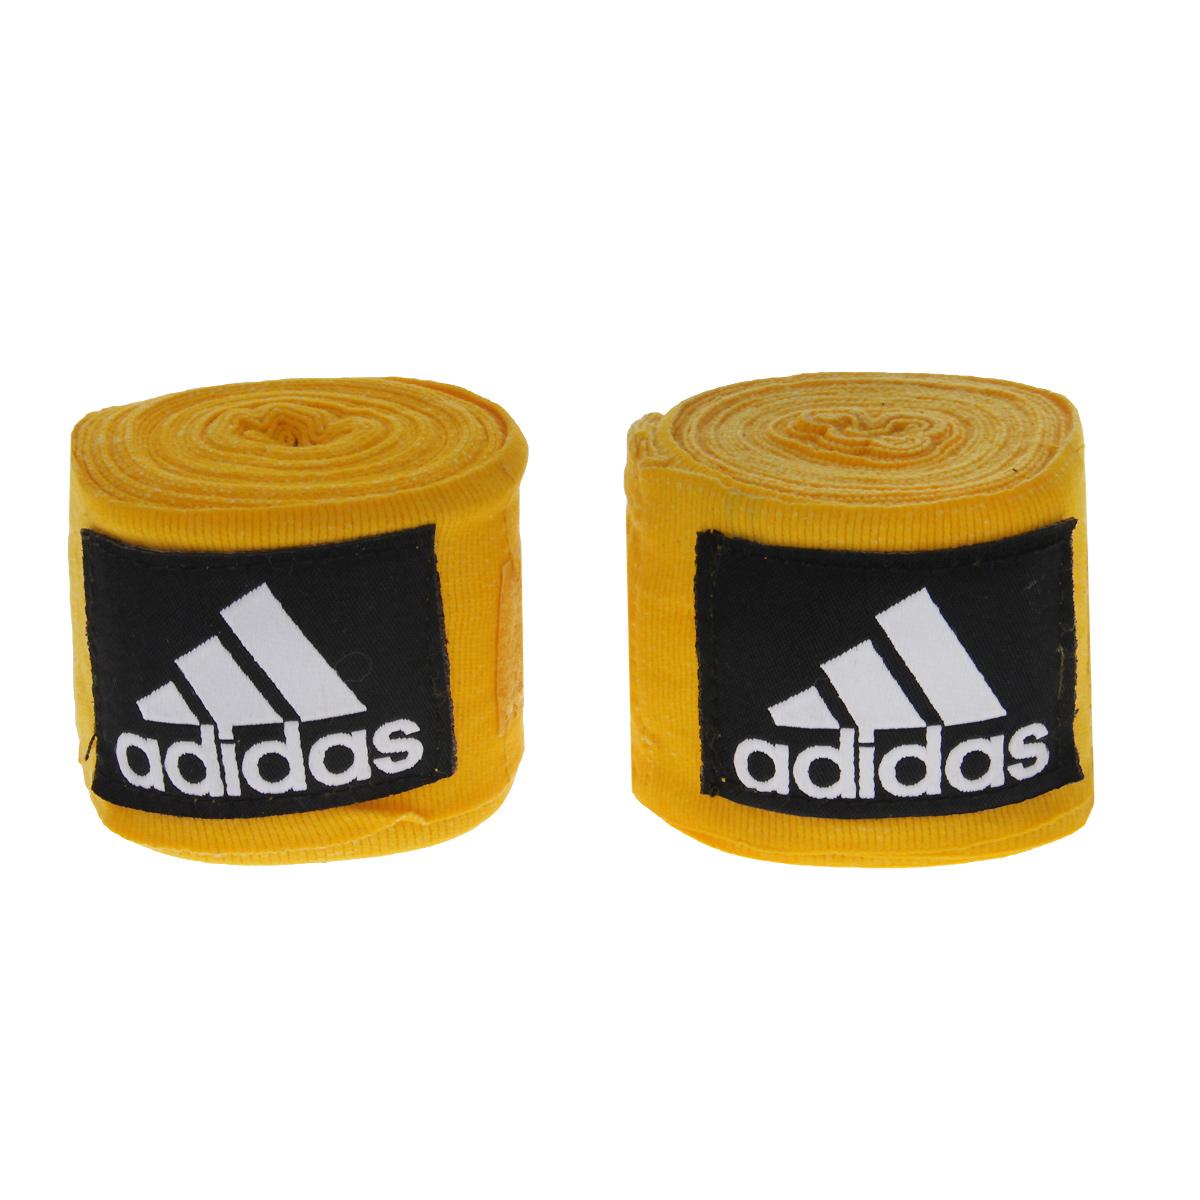 "adidas Бинт эластичный Adidas ""Boxing Crepe Bandag"", цвет: желтый, 450 см, 2 шт"